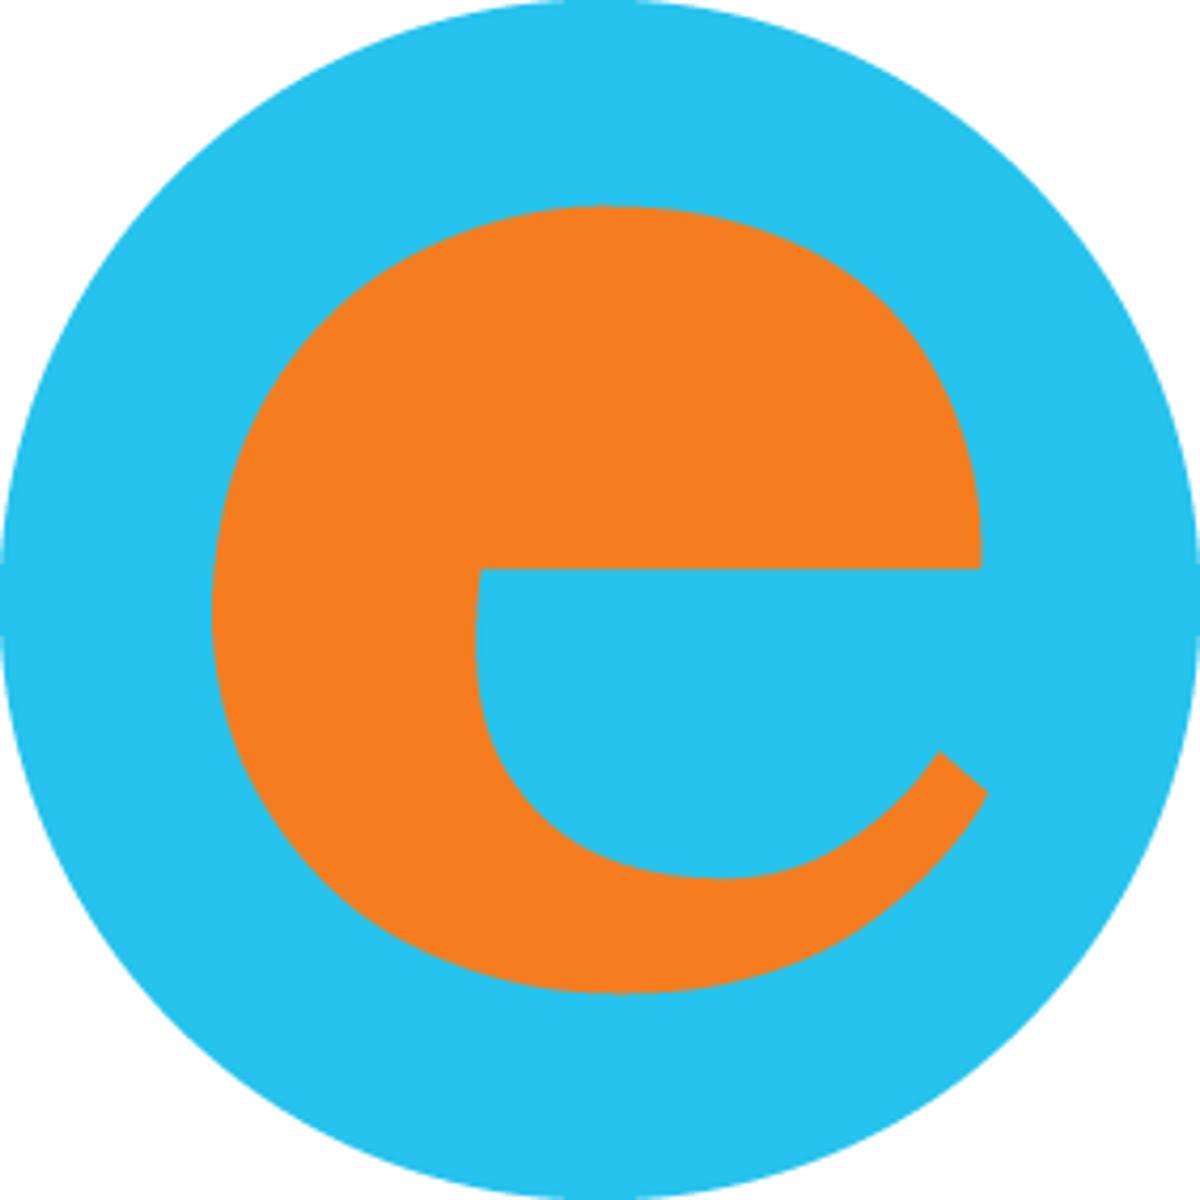 Corona-Maßnahmen werden verlängert und verschärft